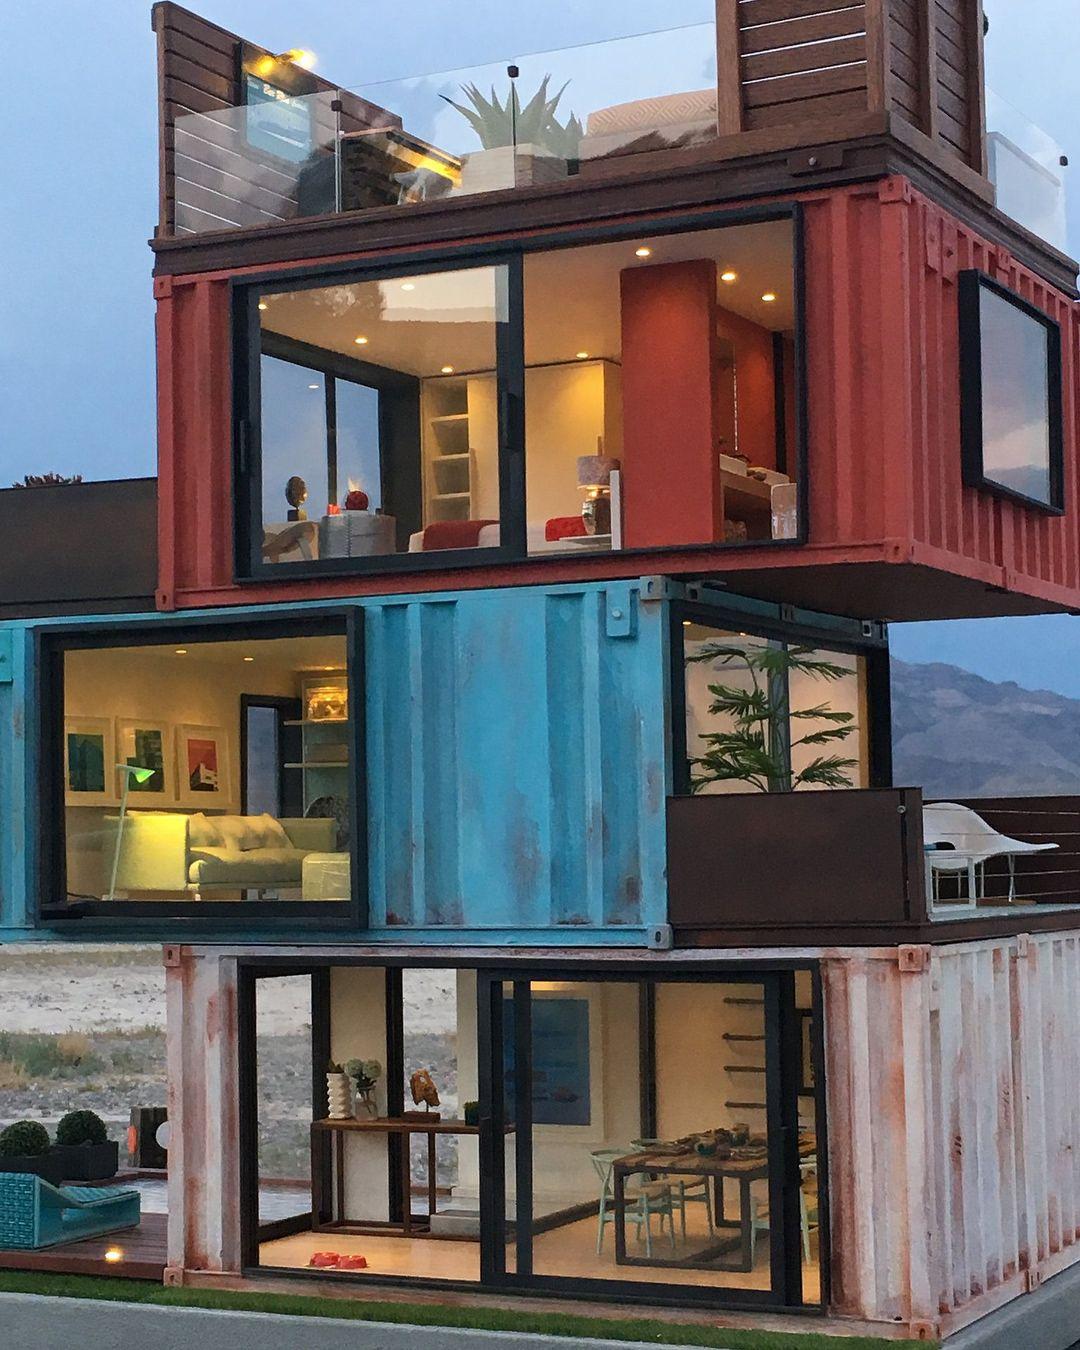 32 1 Tys Otmetok Nravitsya 330 Kommentariev Architecture Design Architectanddesign V Ins Container House Container House Plans Container House Design